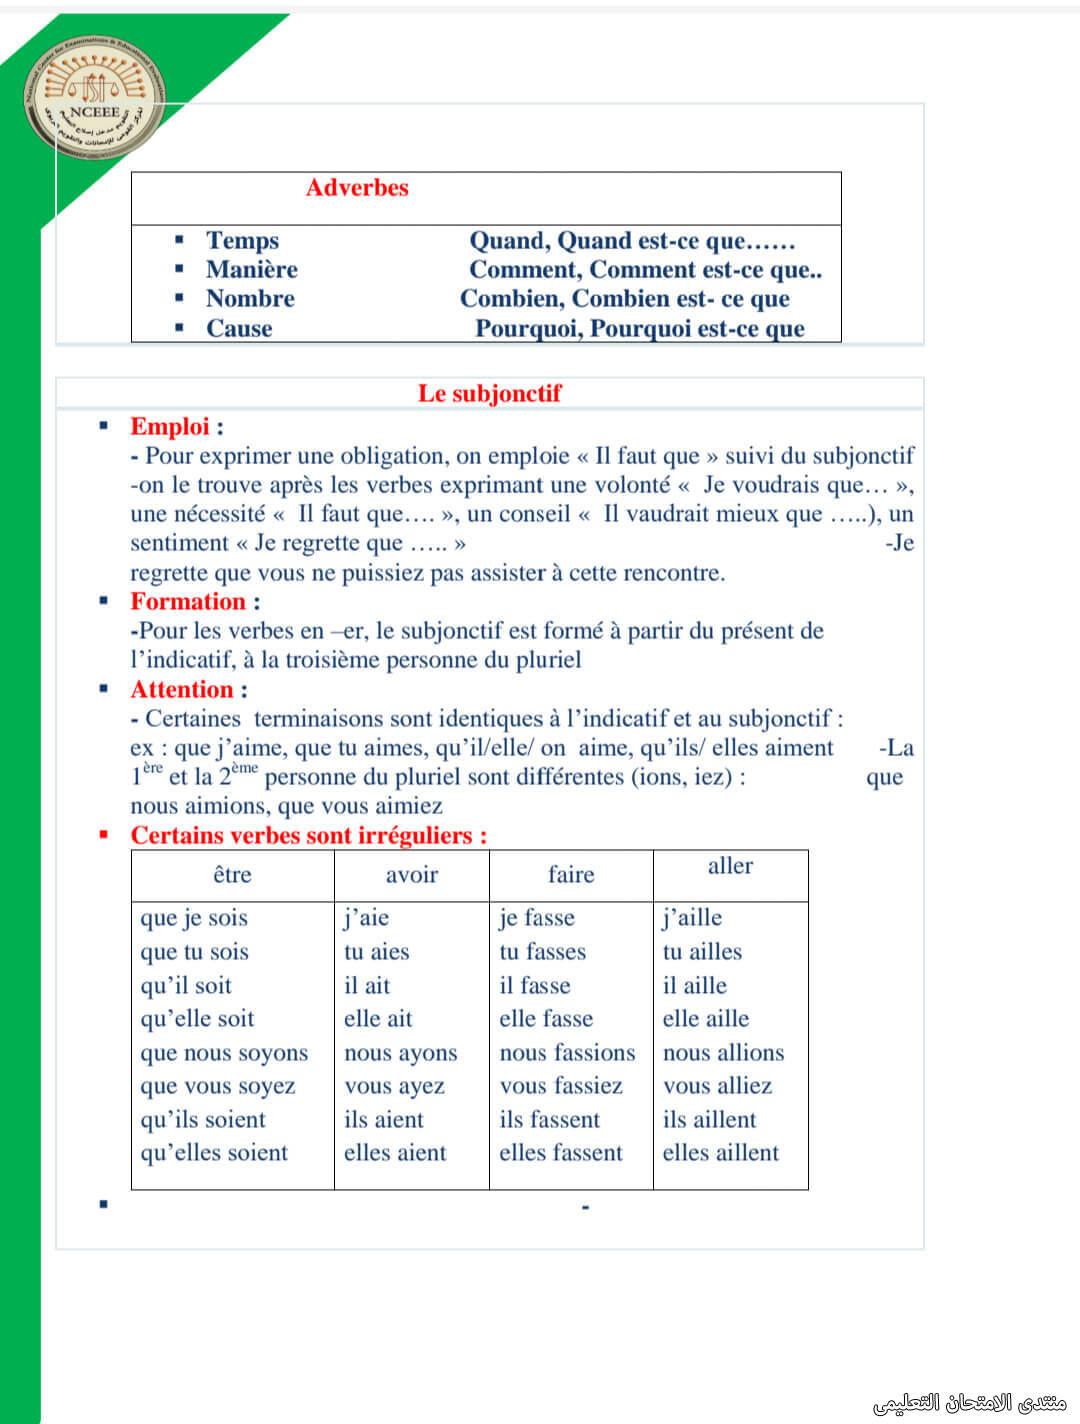 exam-eg.com_1619306733595814.jpg